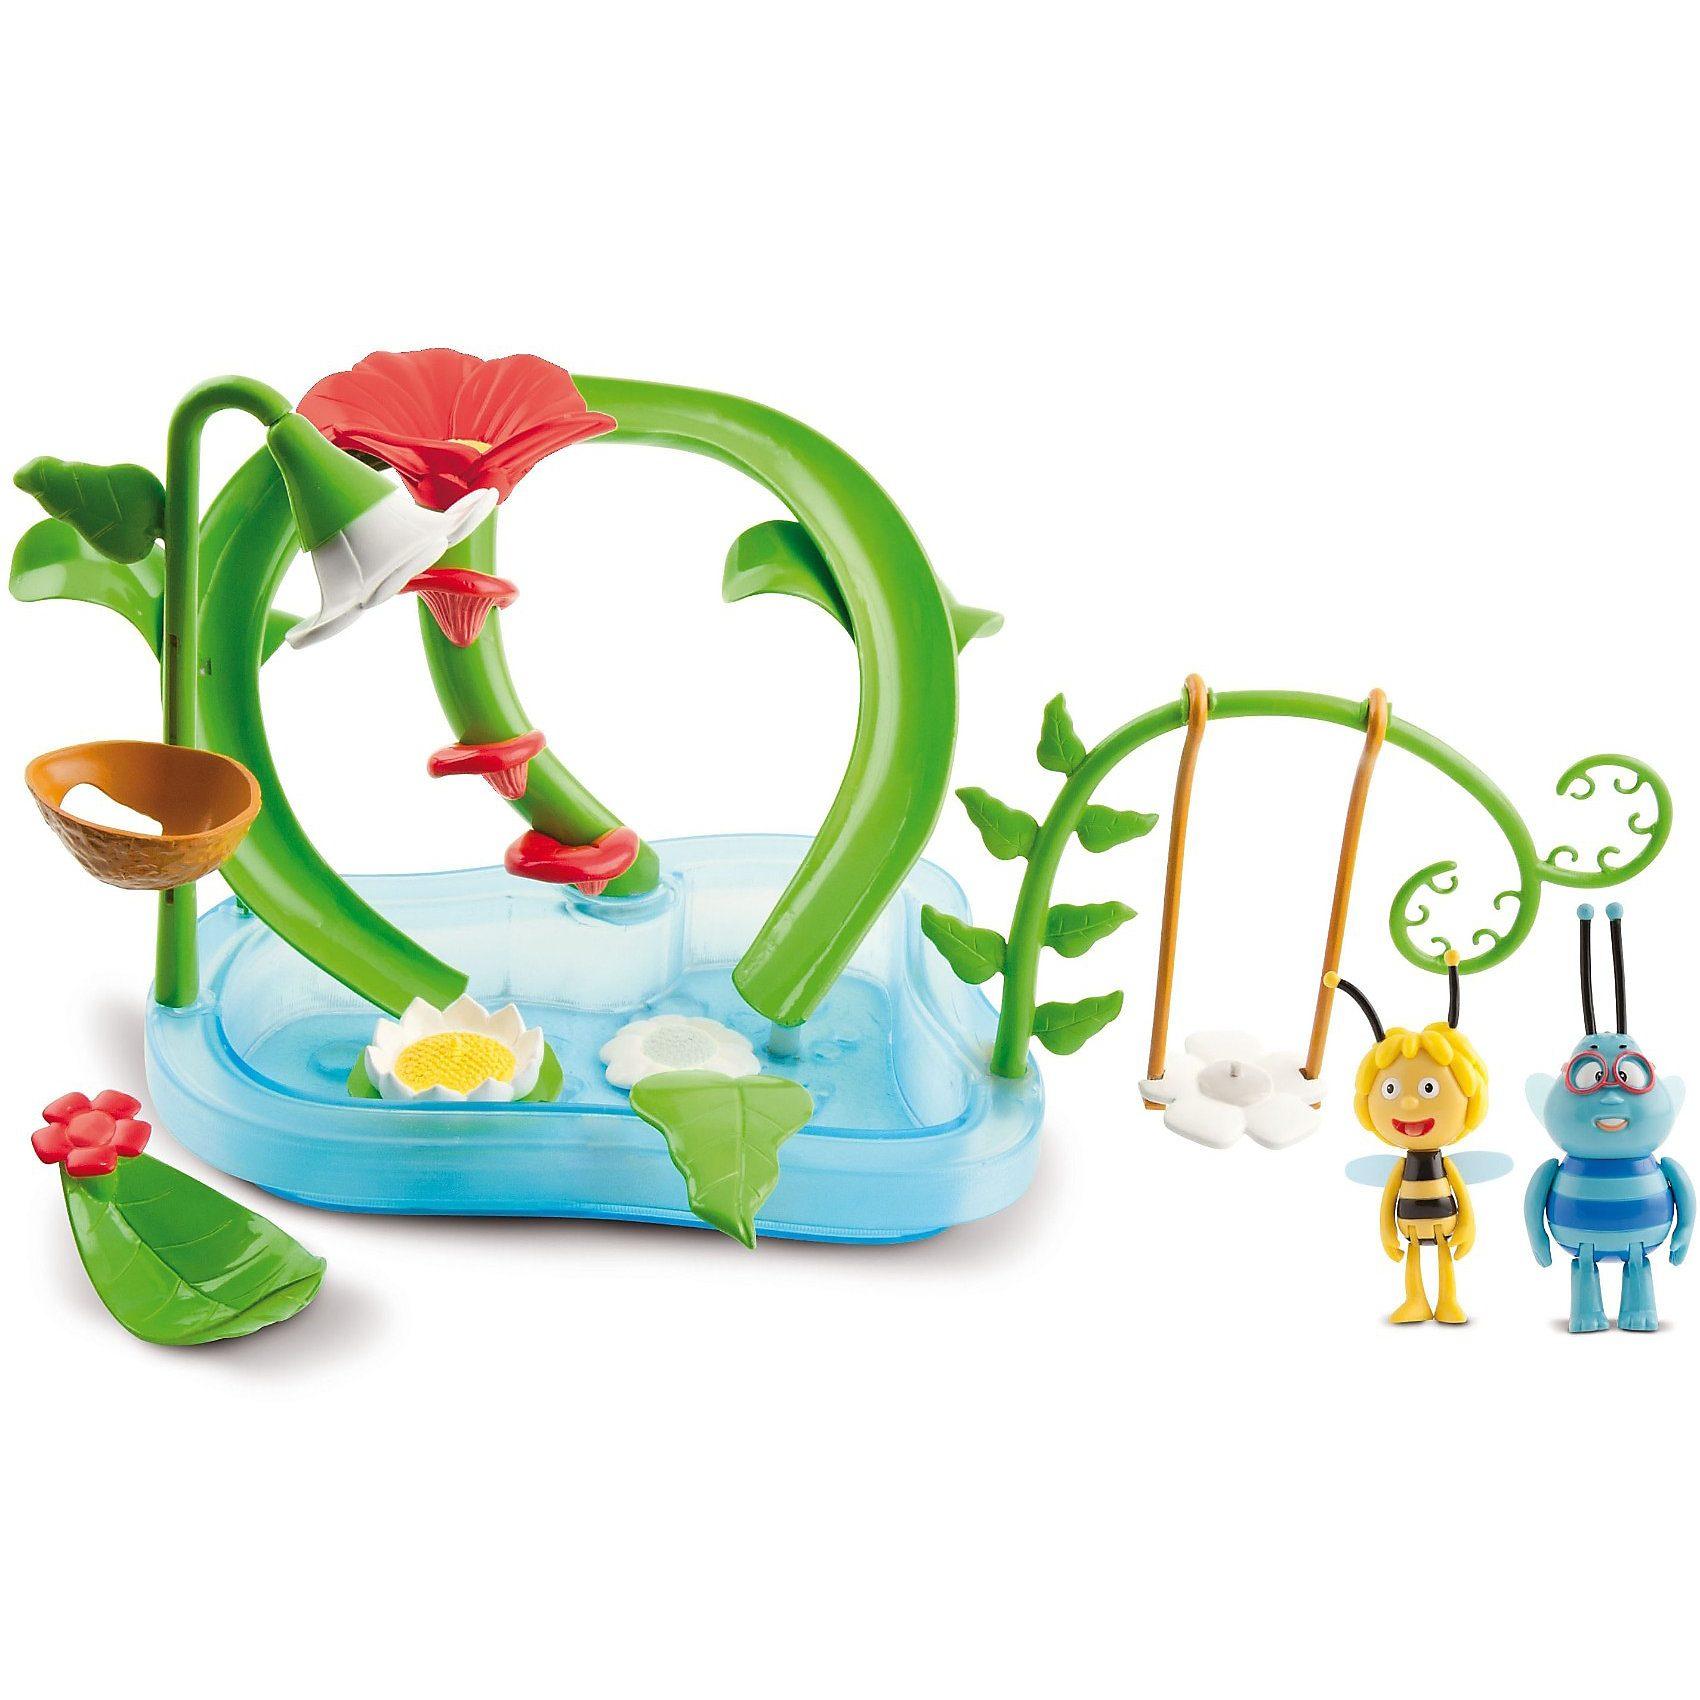 IMC Toys Biene Maja - Wasserspielplatz